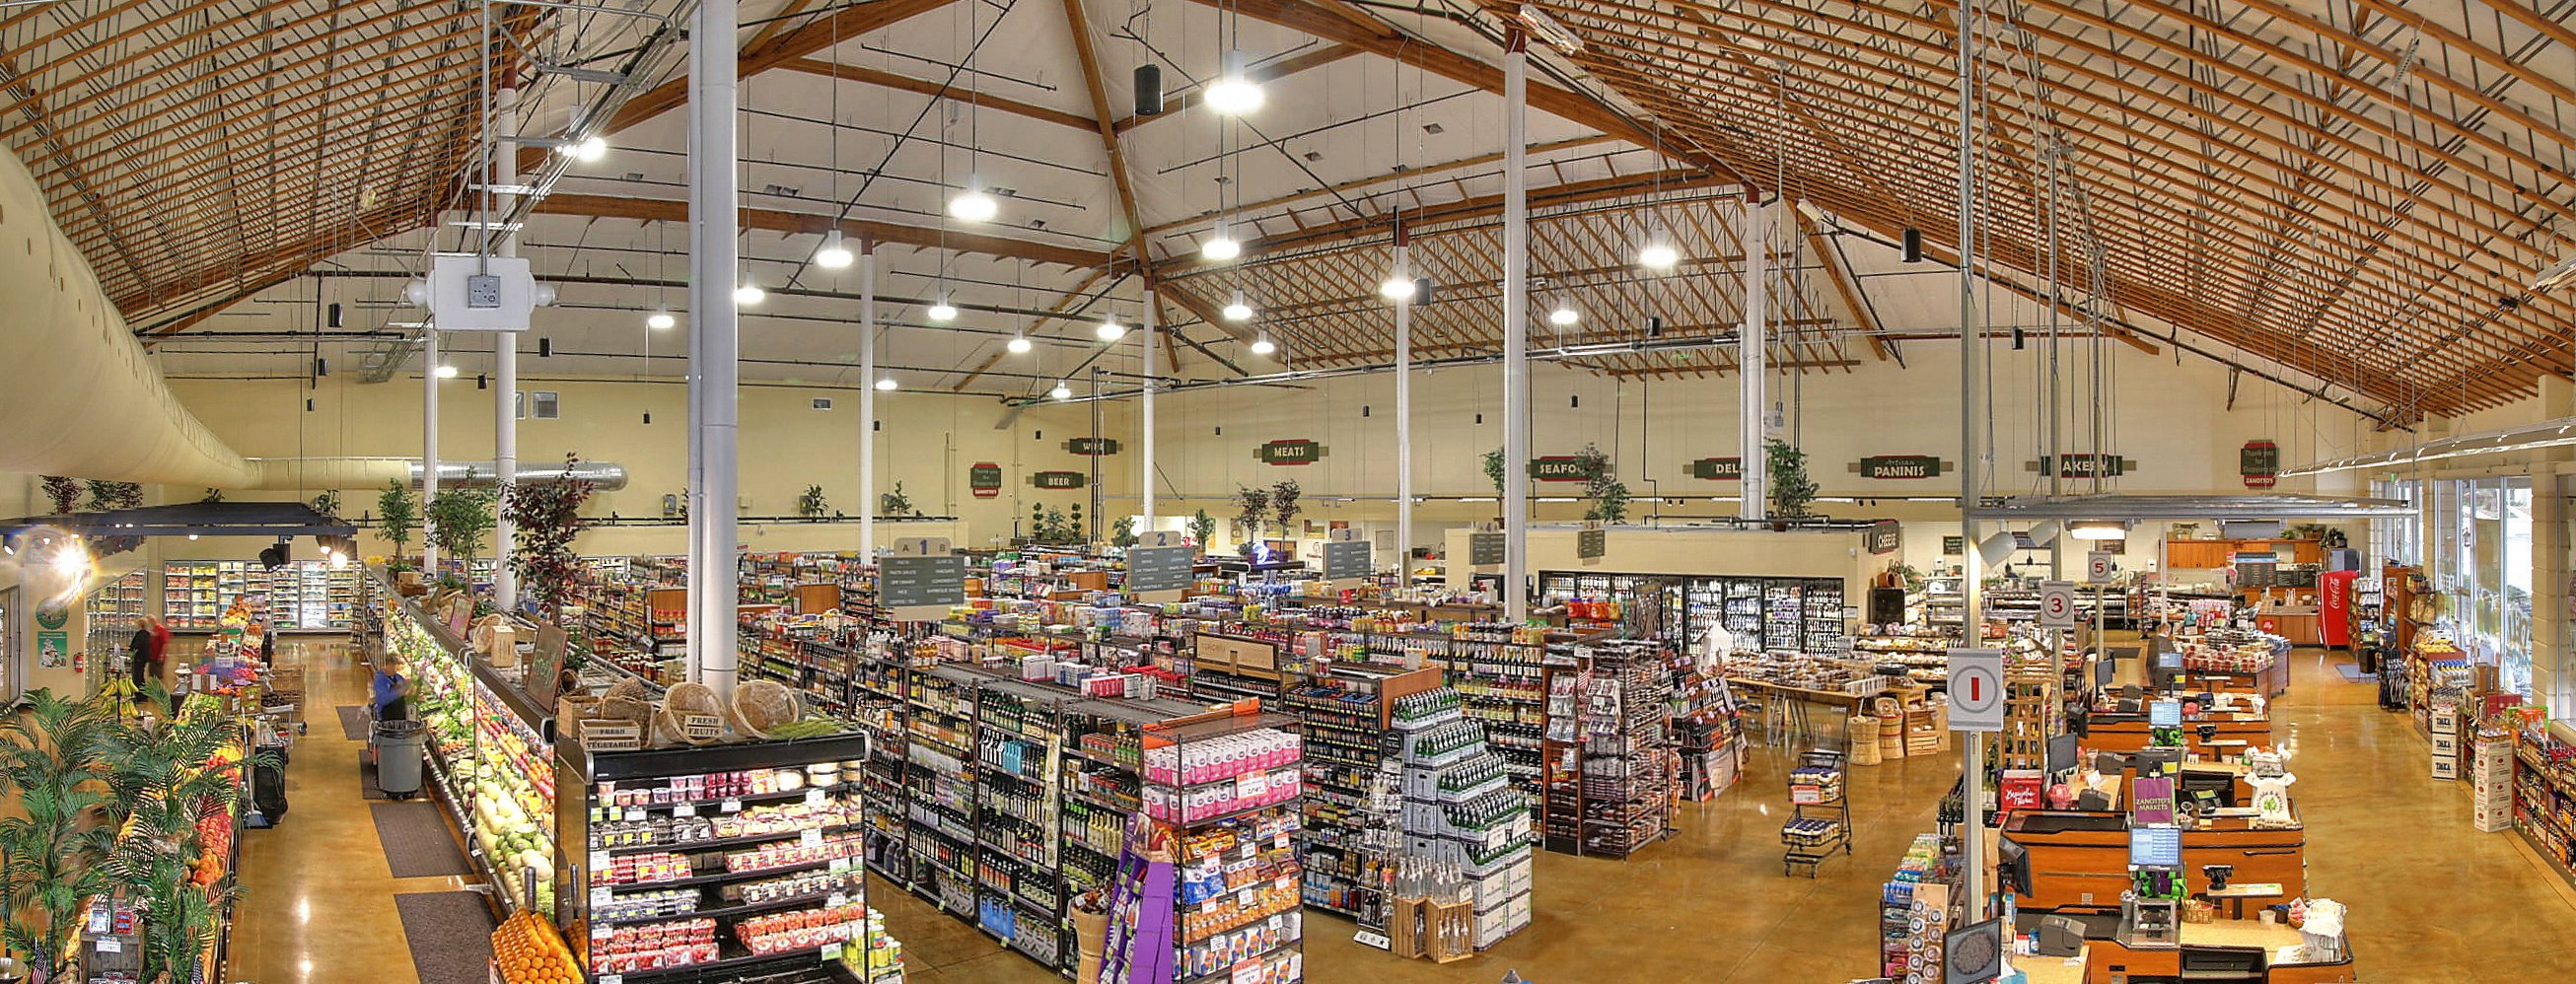 Supermarket Ceiling